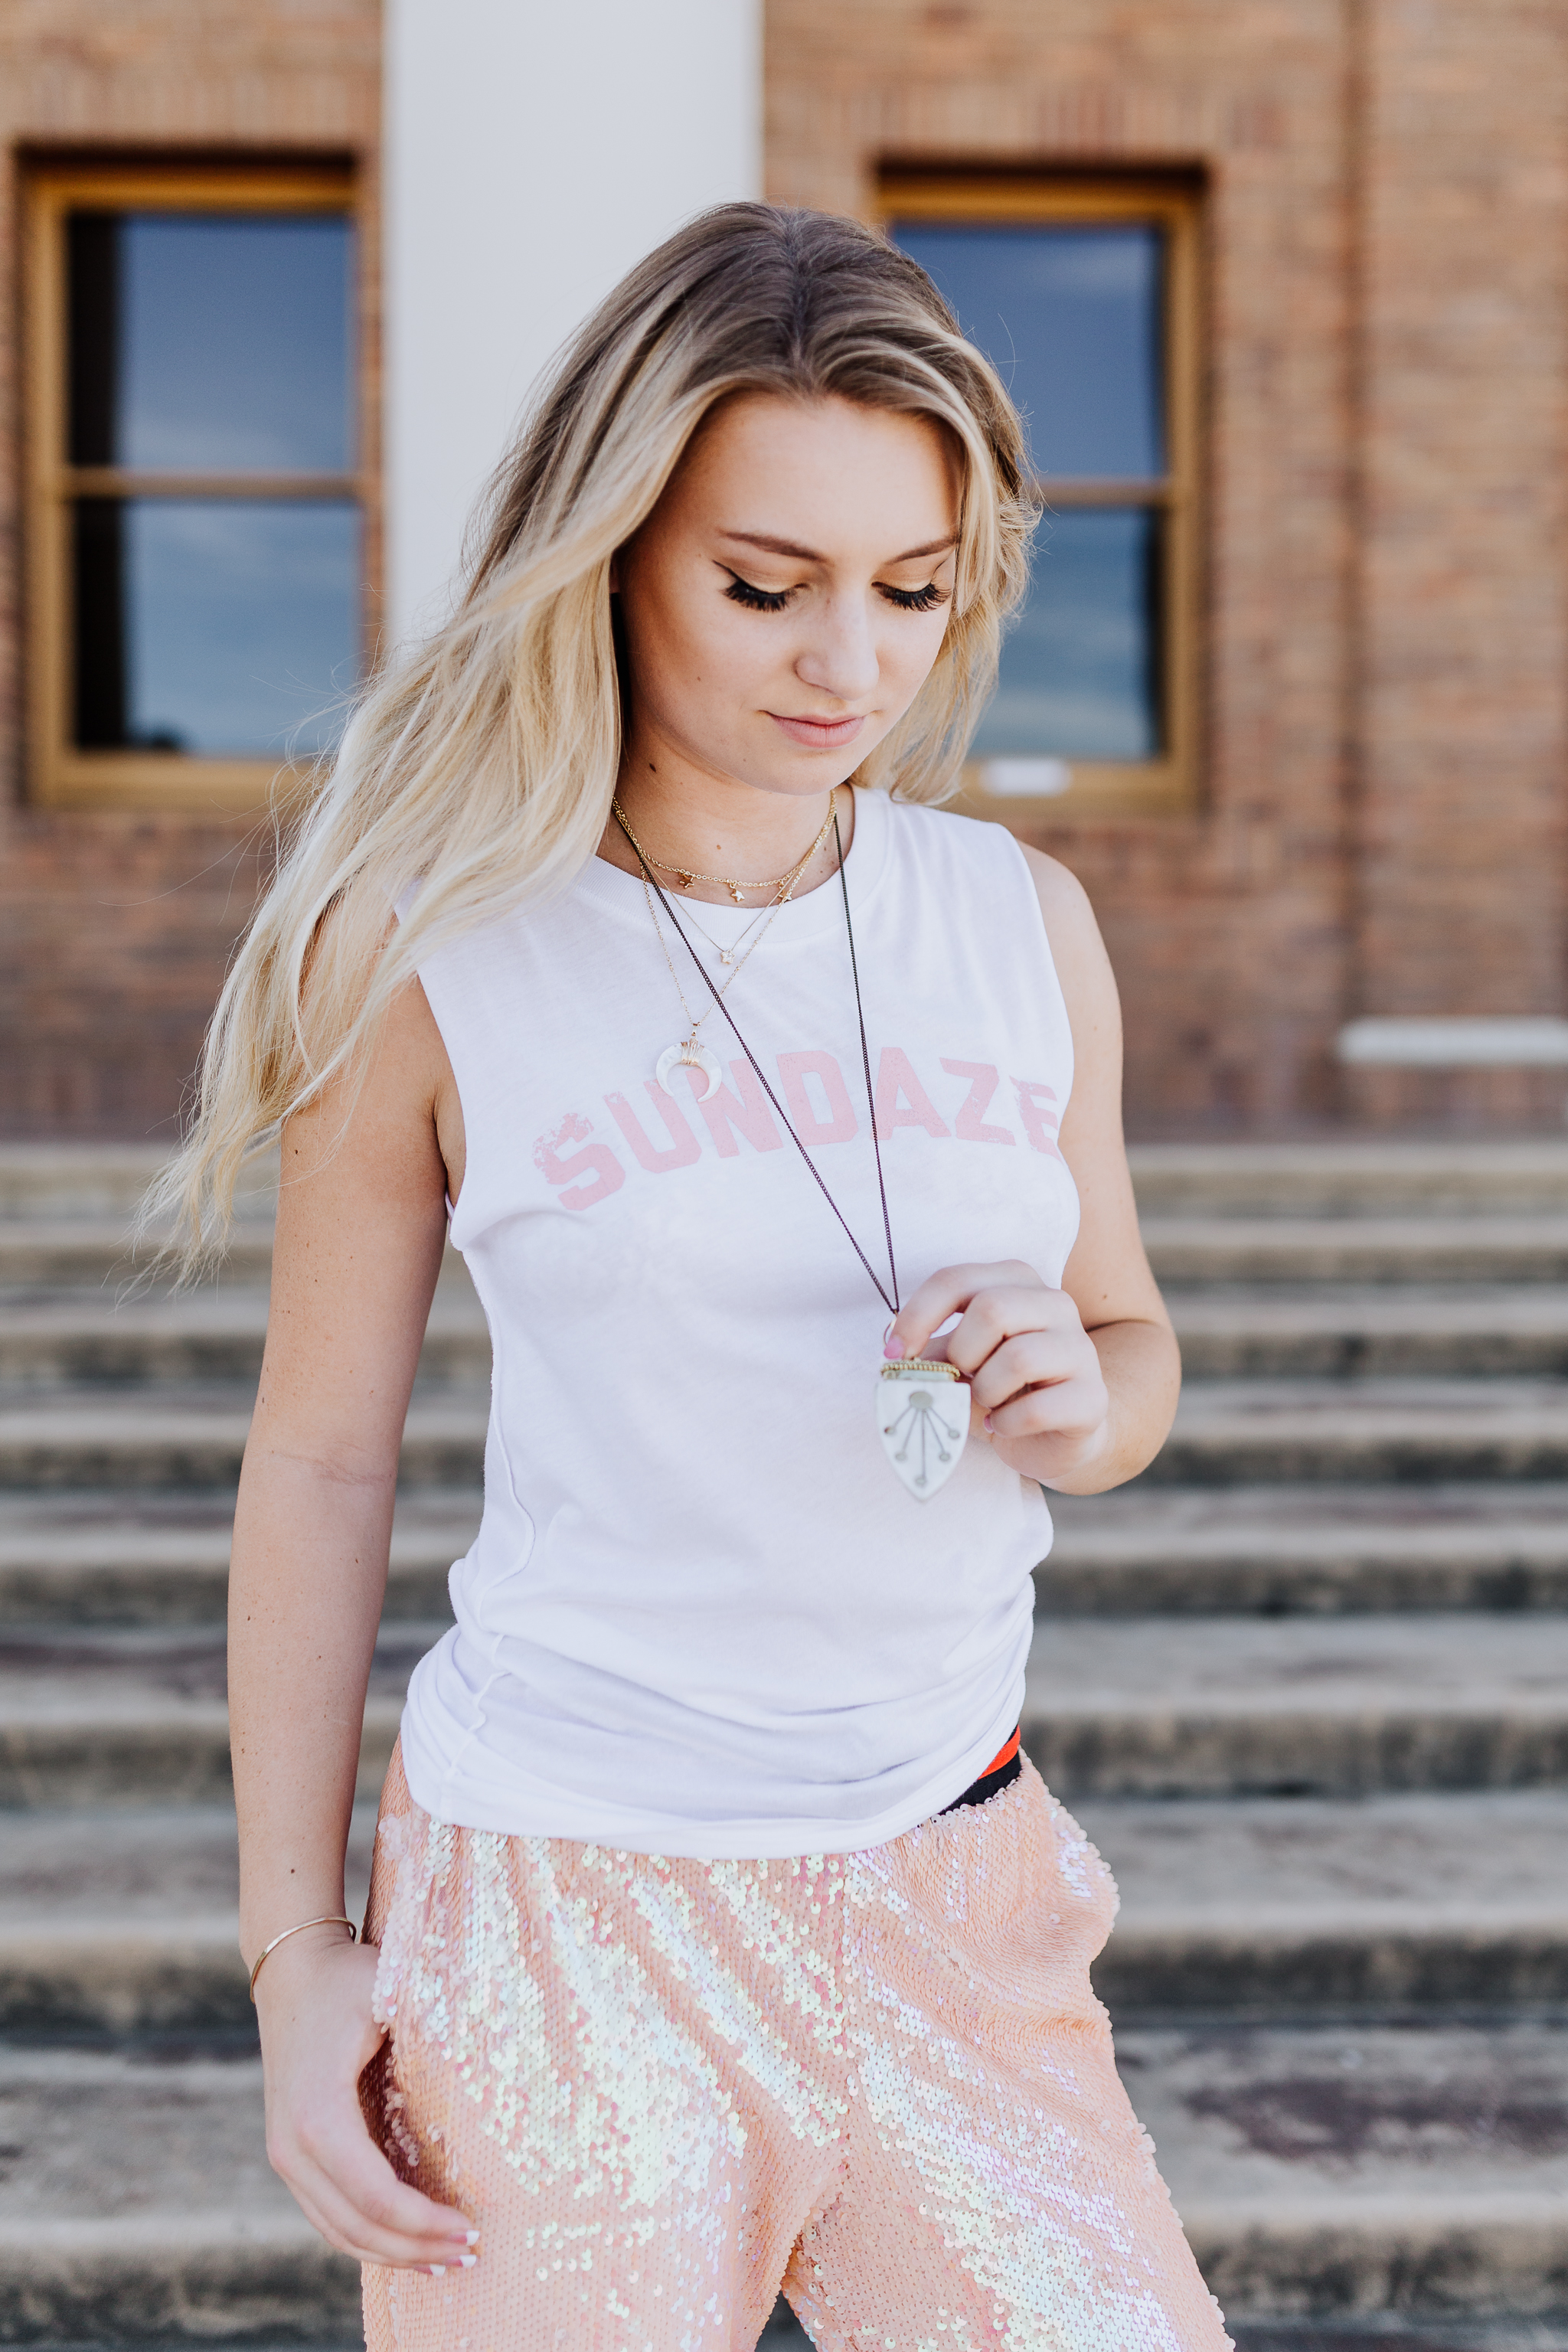 Heidi-Toevs-Editorial-Fashion-Photographer-San-Luis-Obispo-California